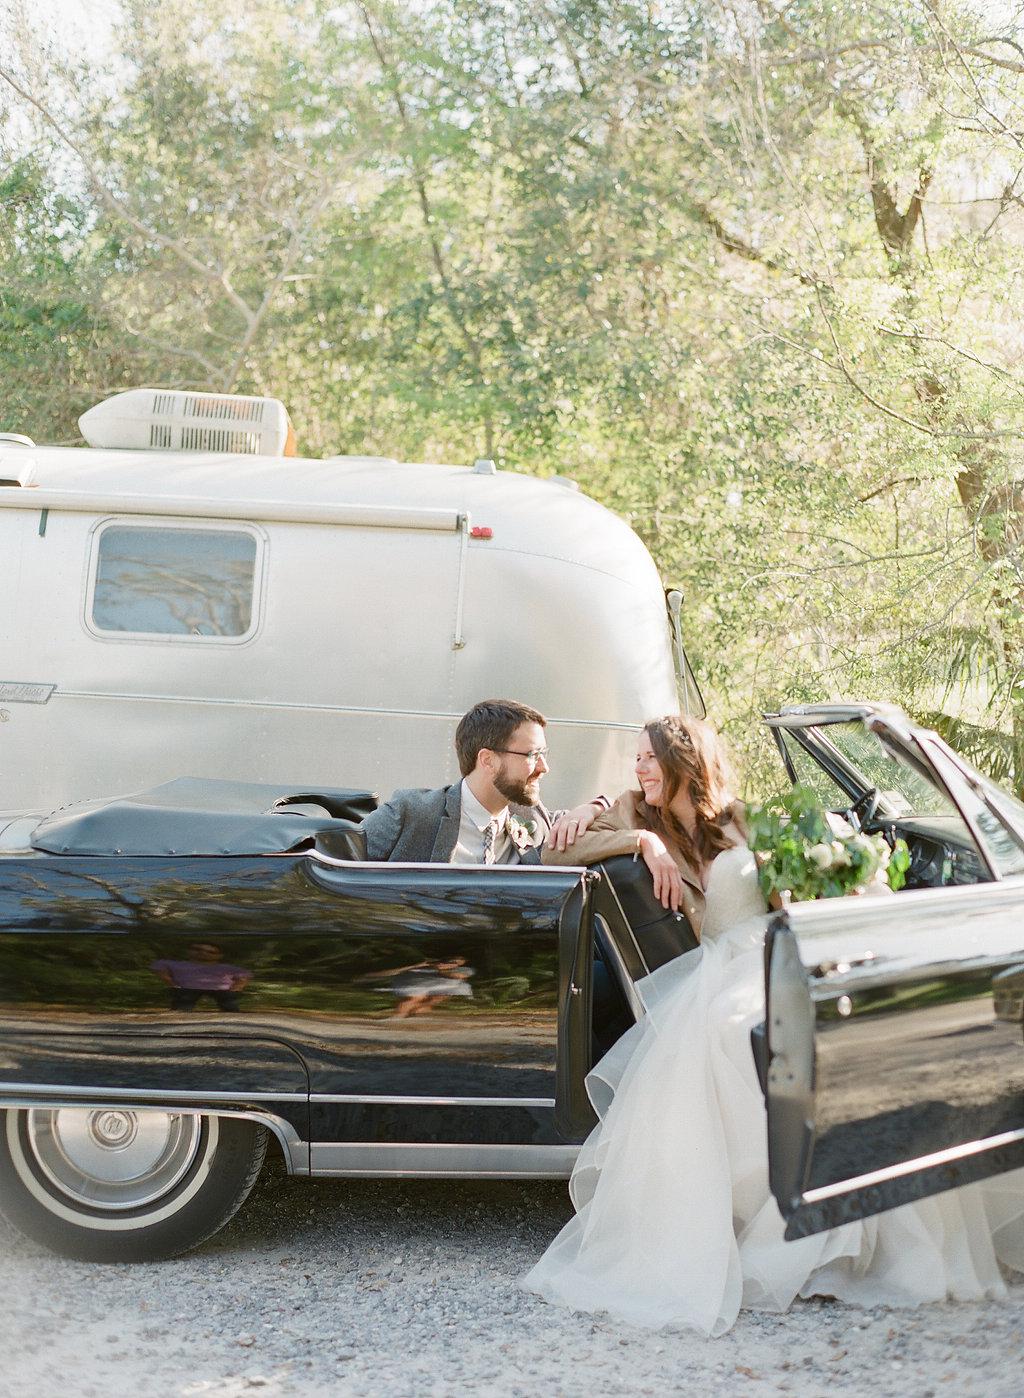 the-wyld-dock-bar-savannah-weddings-savannah-wedding-planner-savannah-event-designer-sarah-seven-worthington-gown-ivory-and-beau-savannah-bridal-boutique-savannah-wedding-dresses.jpg